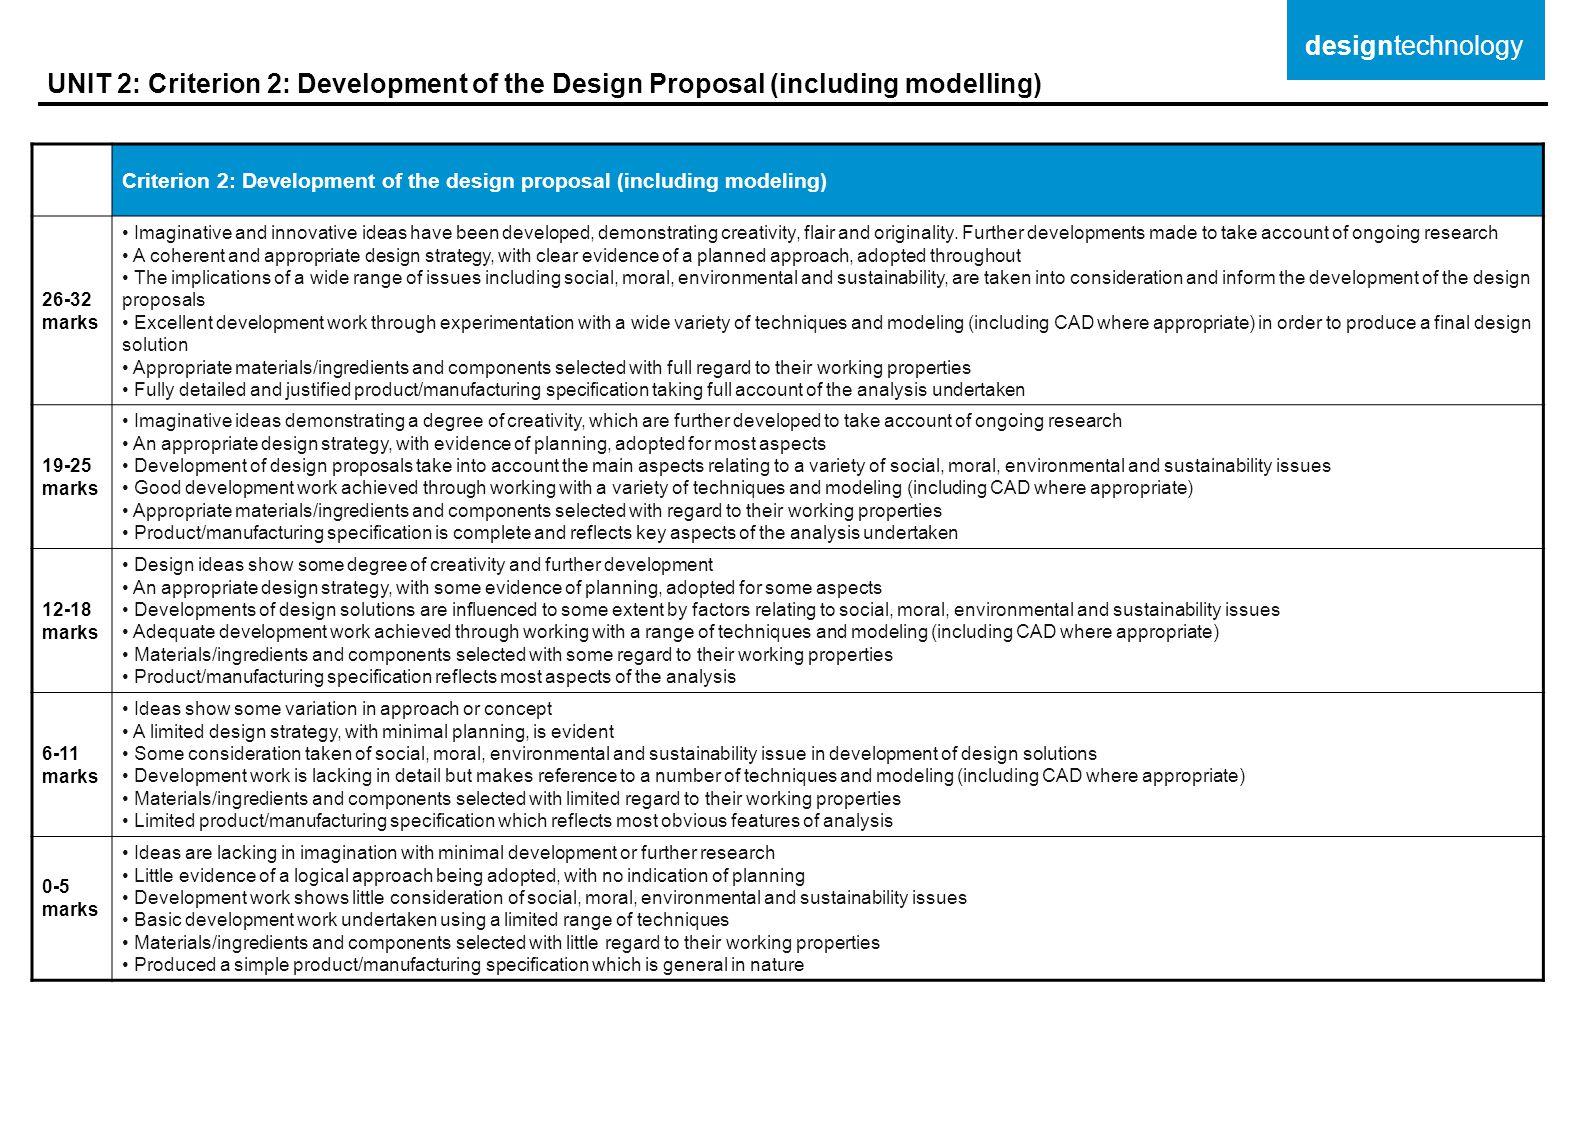 designtechnology UNIT 2: Criterion 2: Development of the Design Proposal (including modelling)